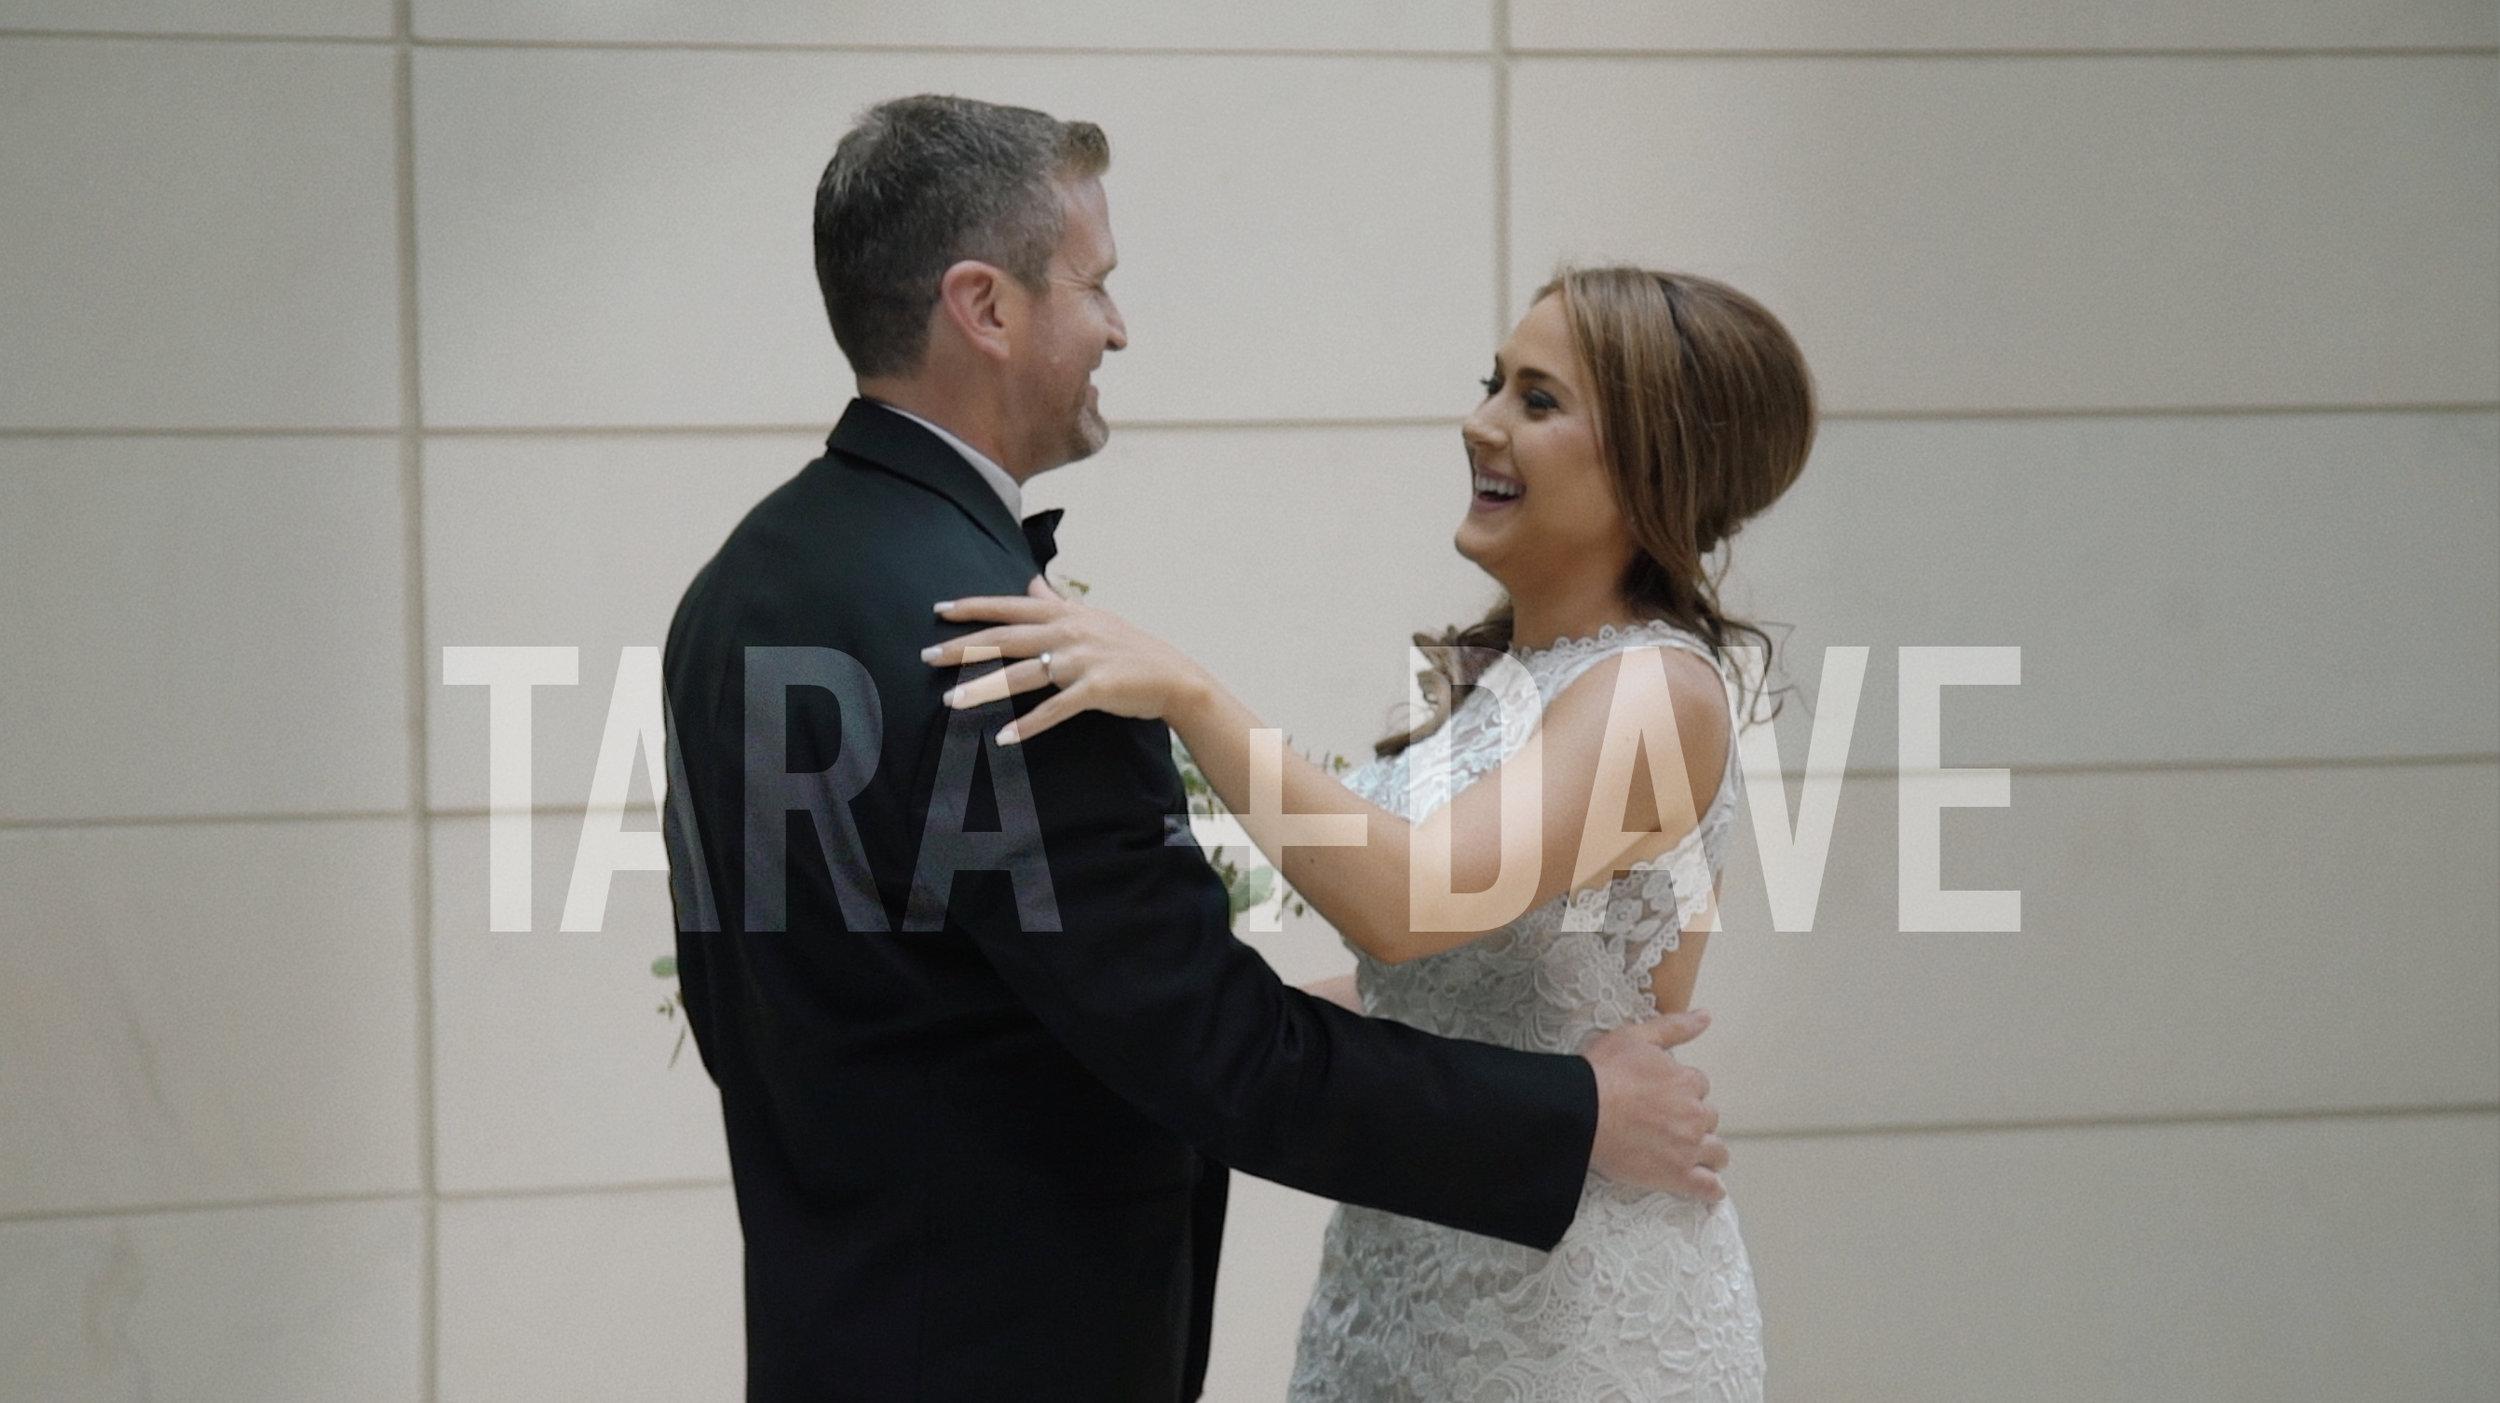 Grove wedding video boise Idaho